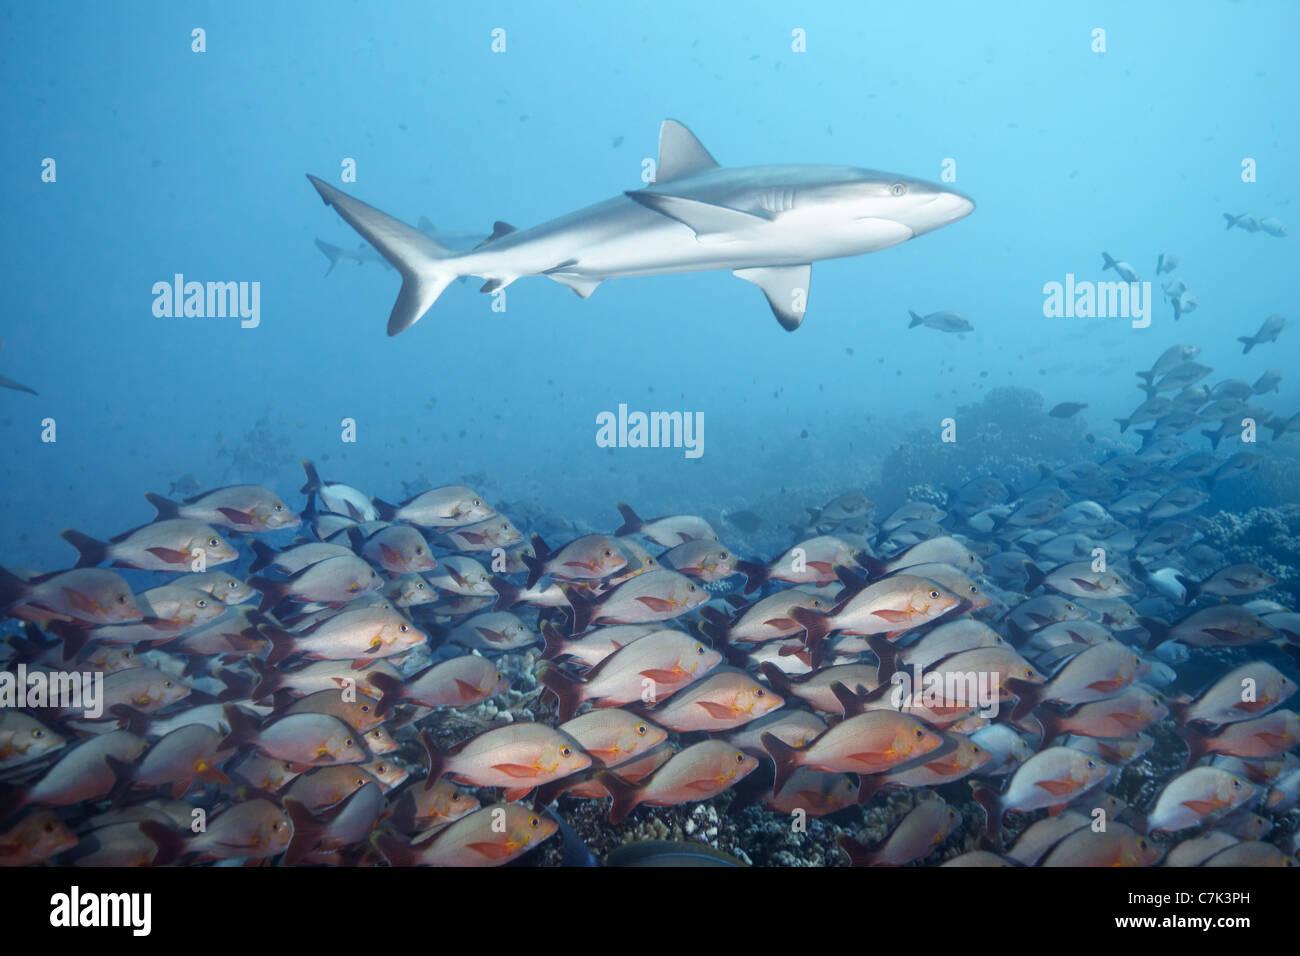 White tip reef shark over school of fish - Stock Image